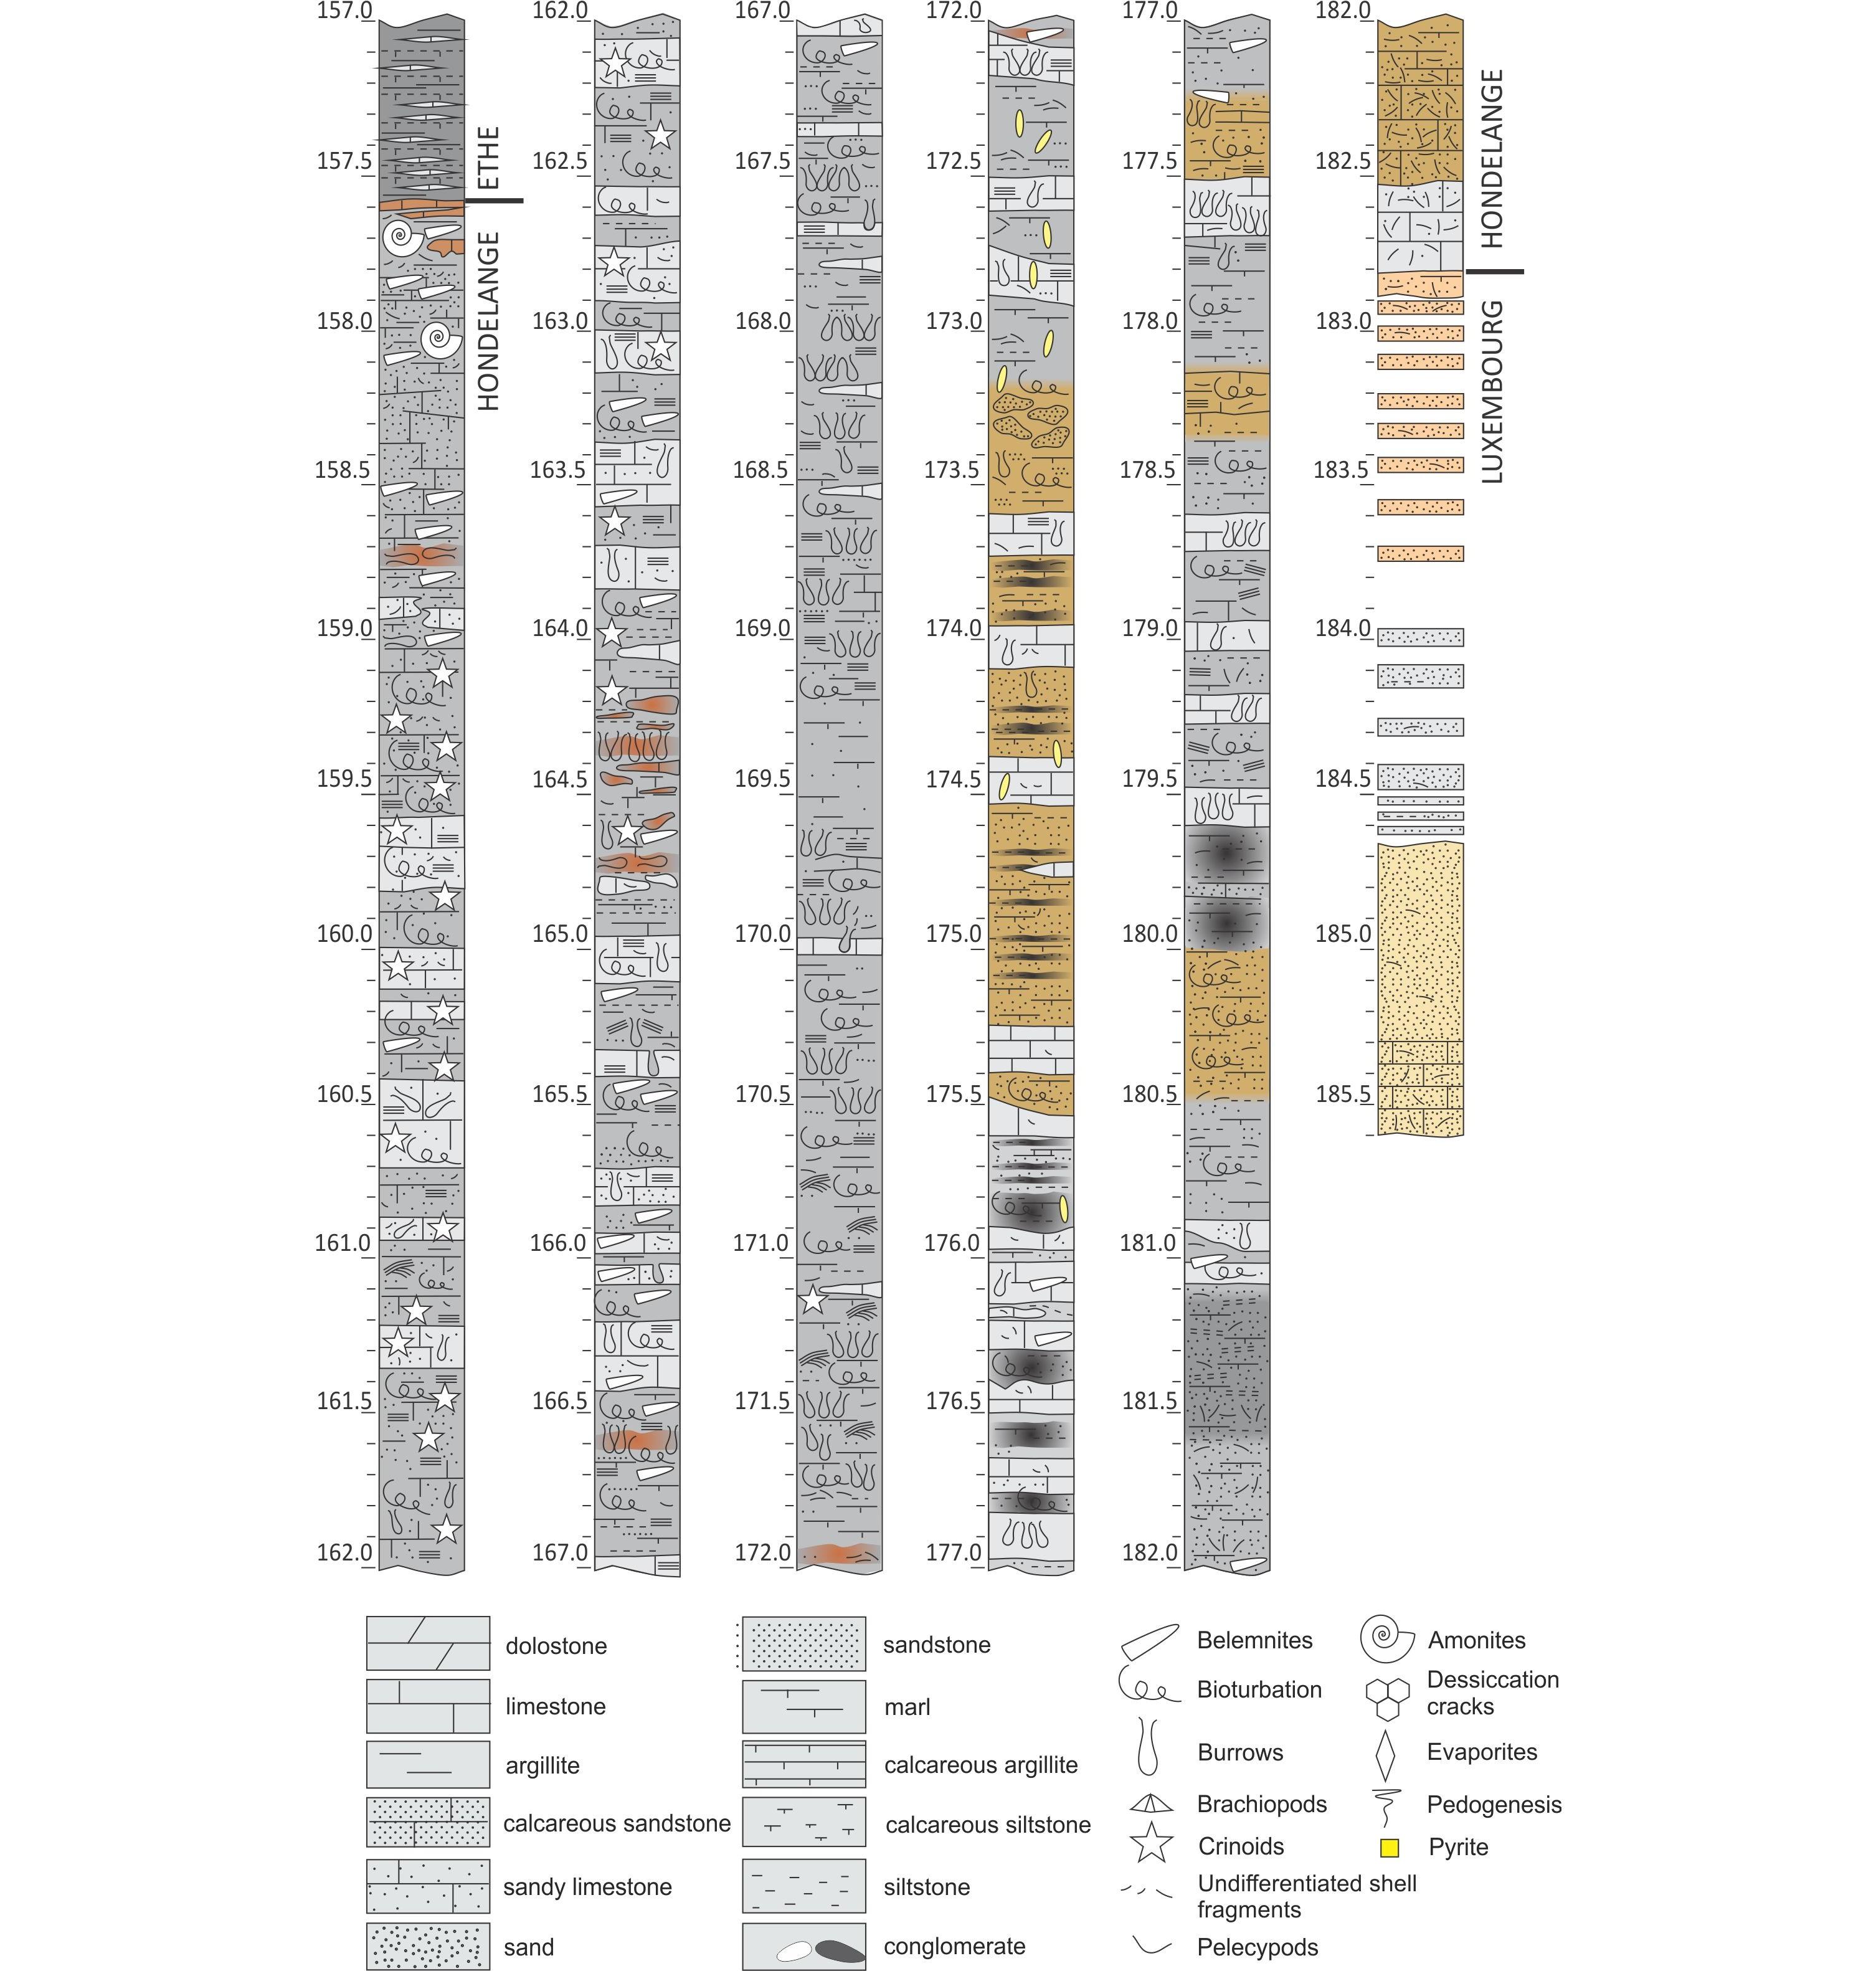 Imprimerie De L Ouest Parisien the hondelange formation and the sequence stratigraphic